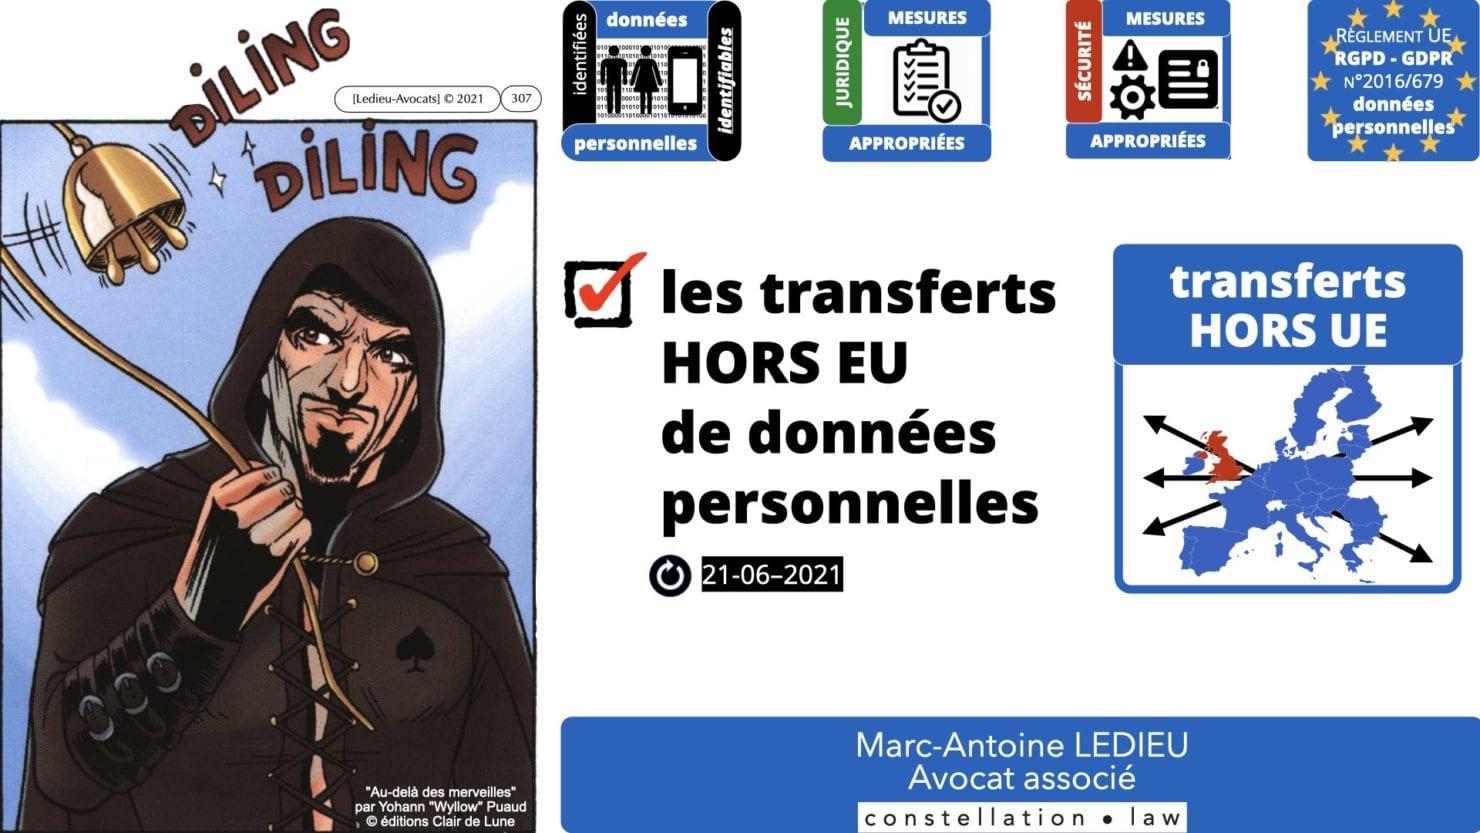 RGPD e-Privacy principes actualité jurisprudence ©Ledieu-Avocats 25-06-2021.307